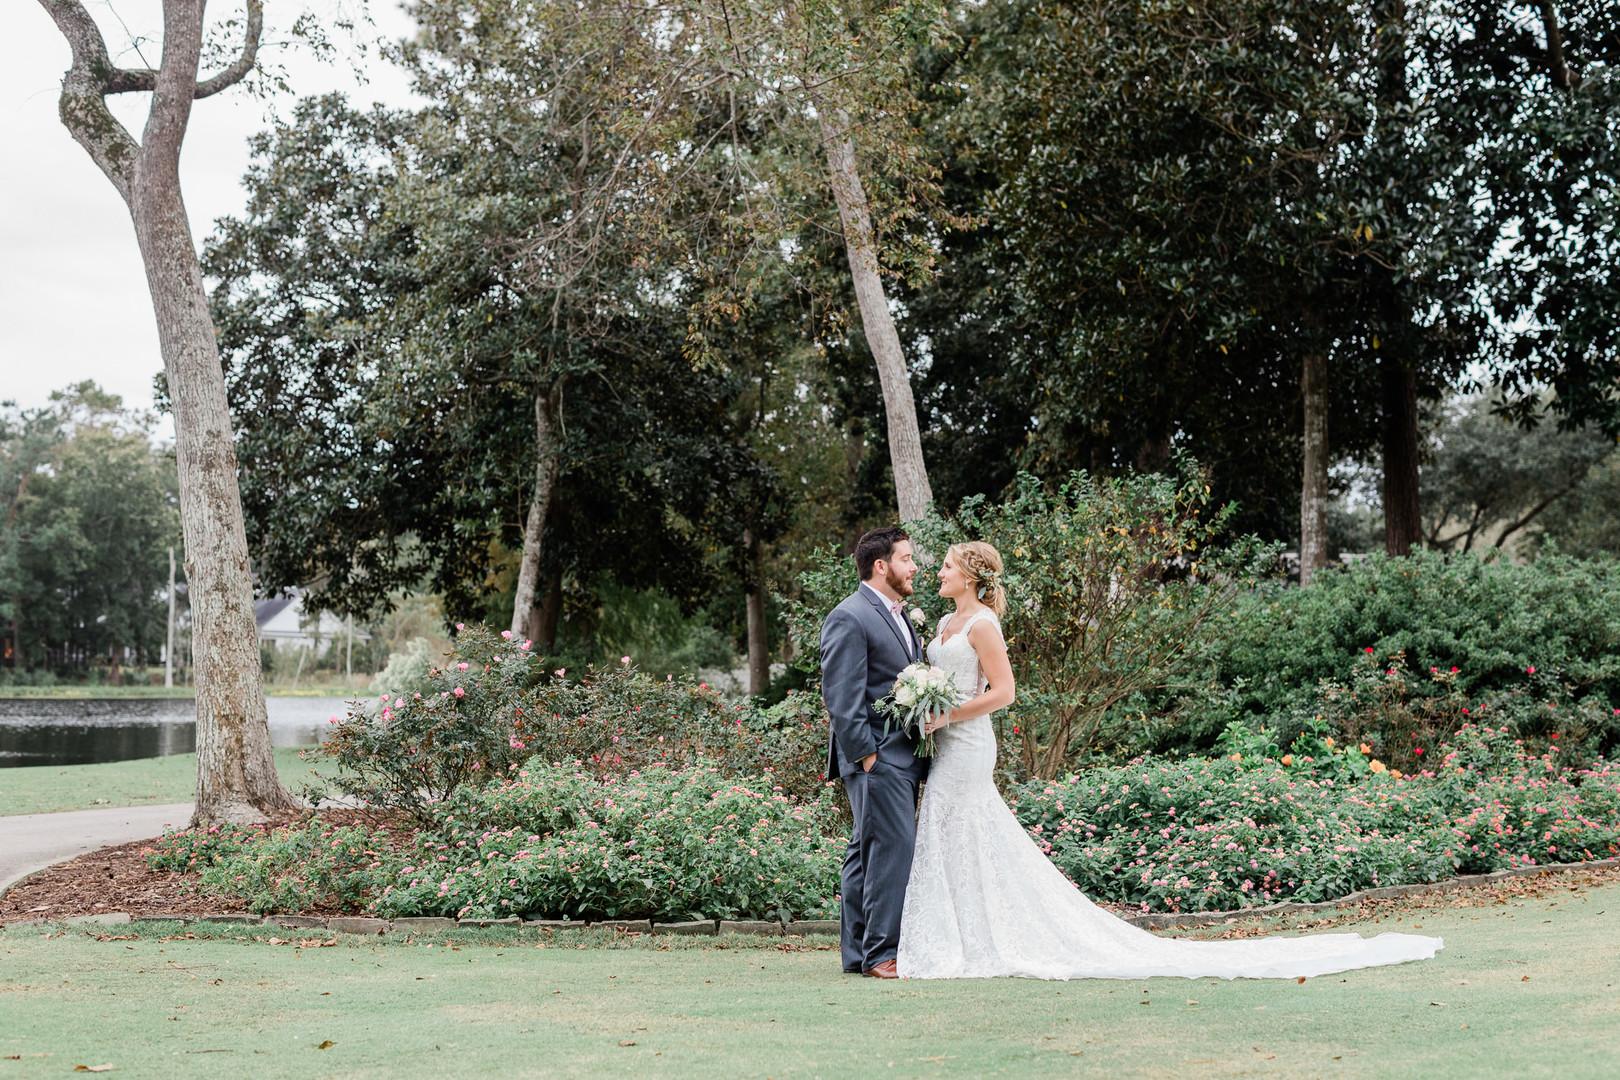 pawleys-plantation-wedding-24.jpg